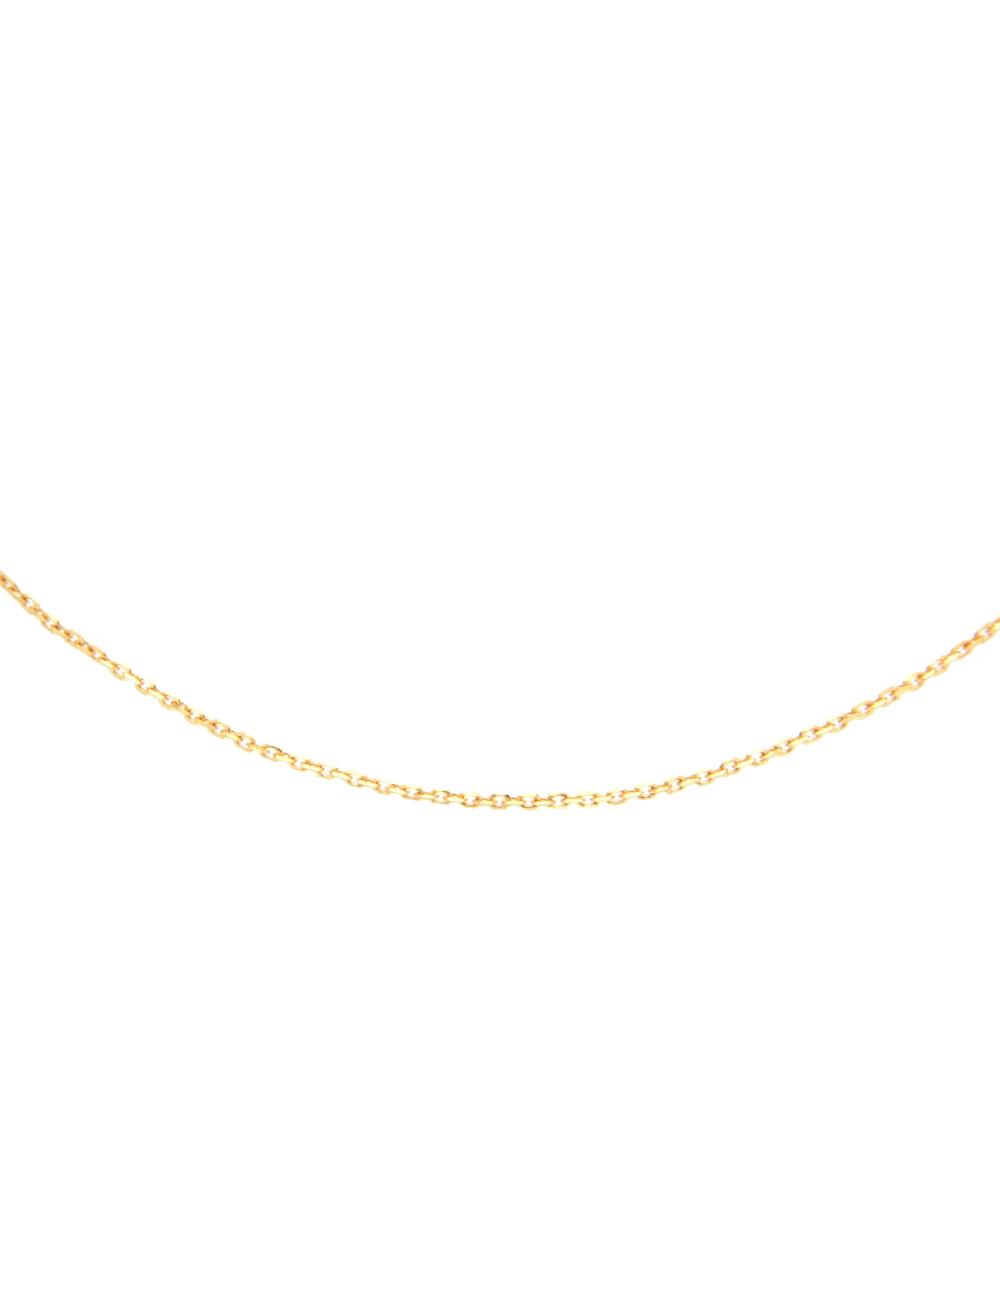 Pendentif Coeur Or Jaune 18 Carats + chaine